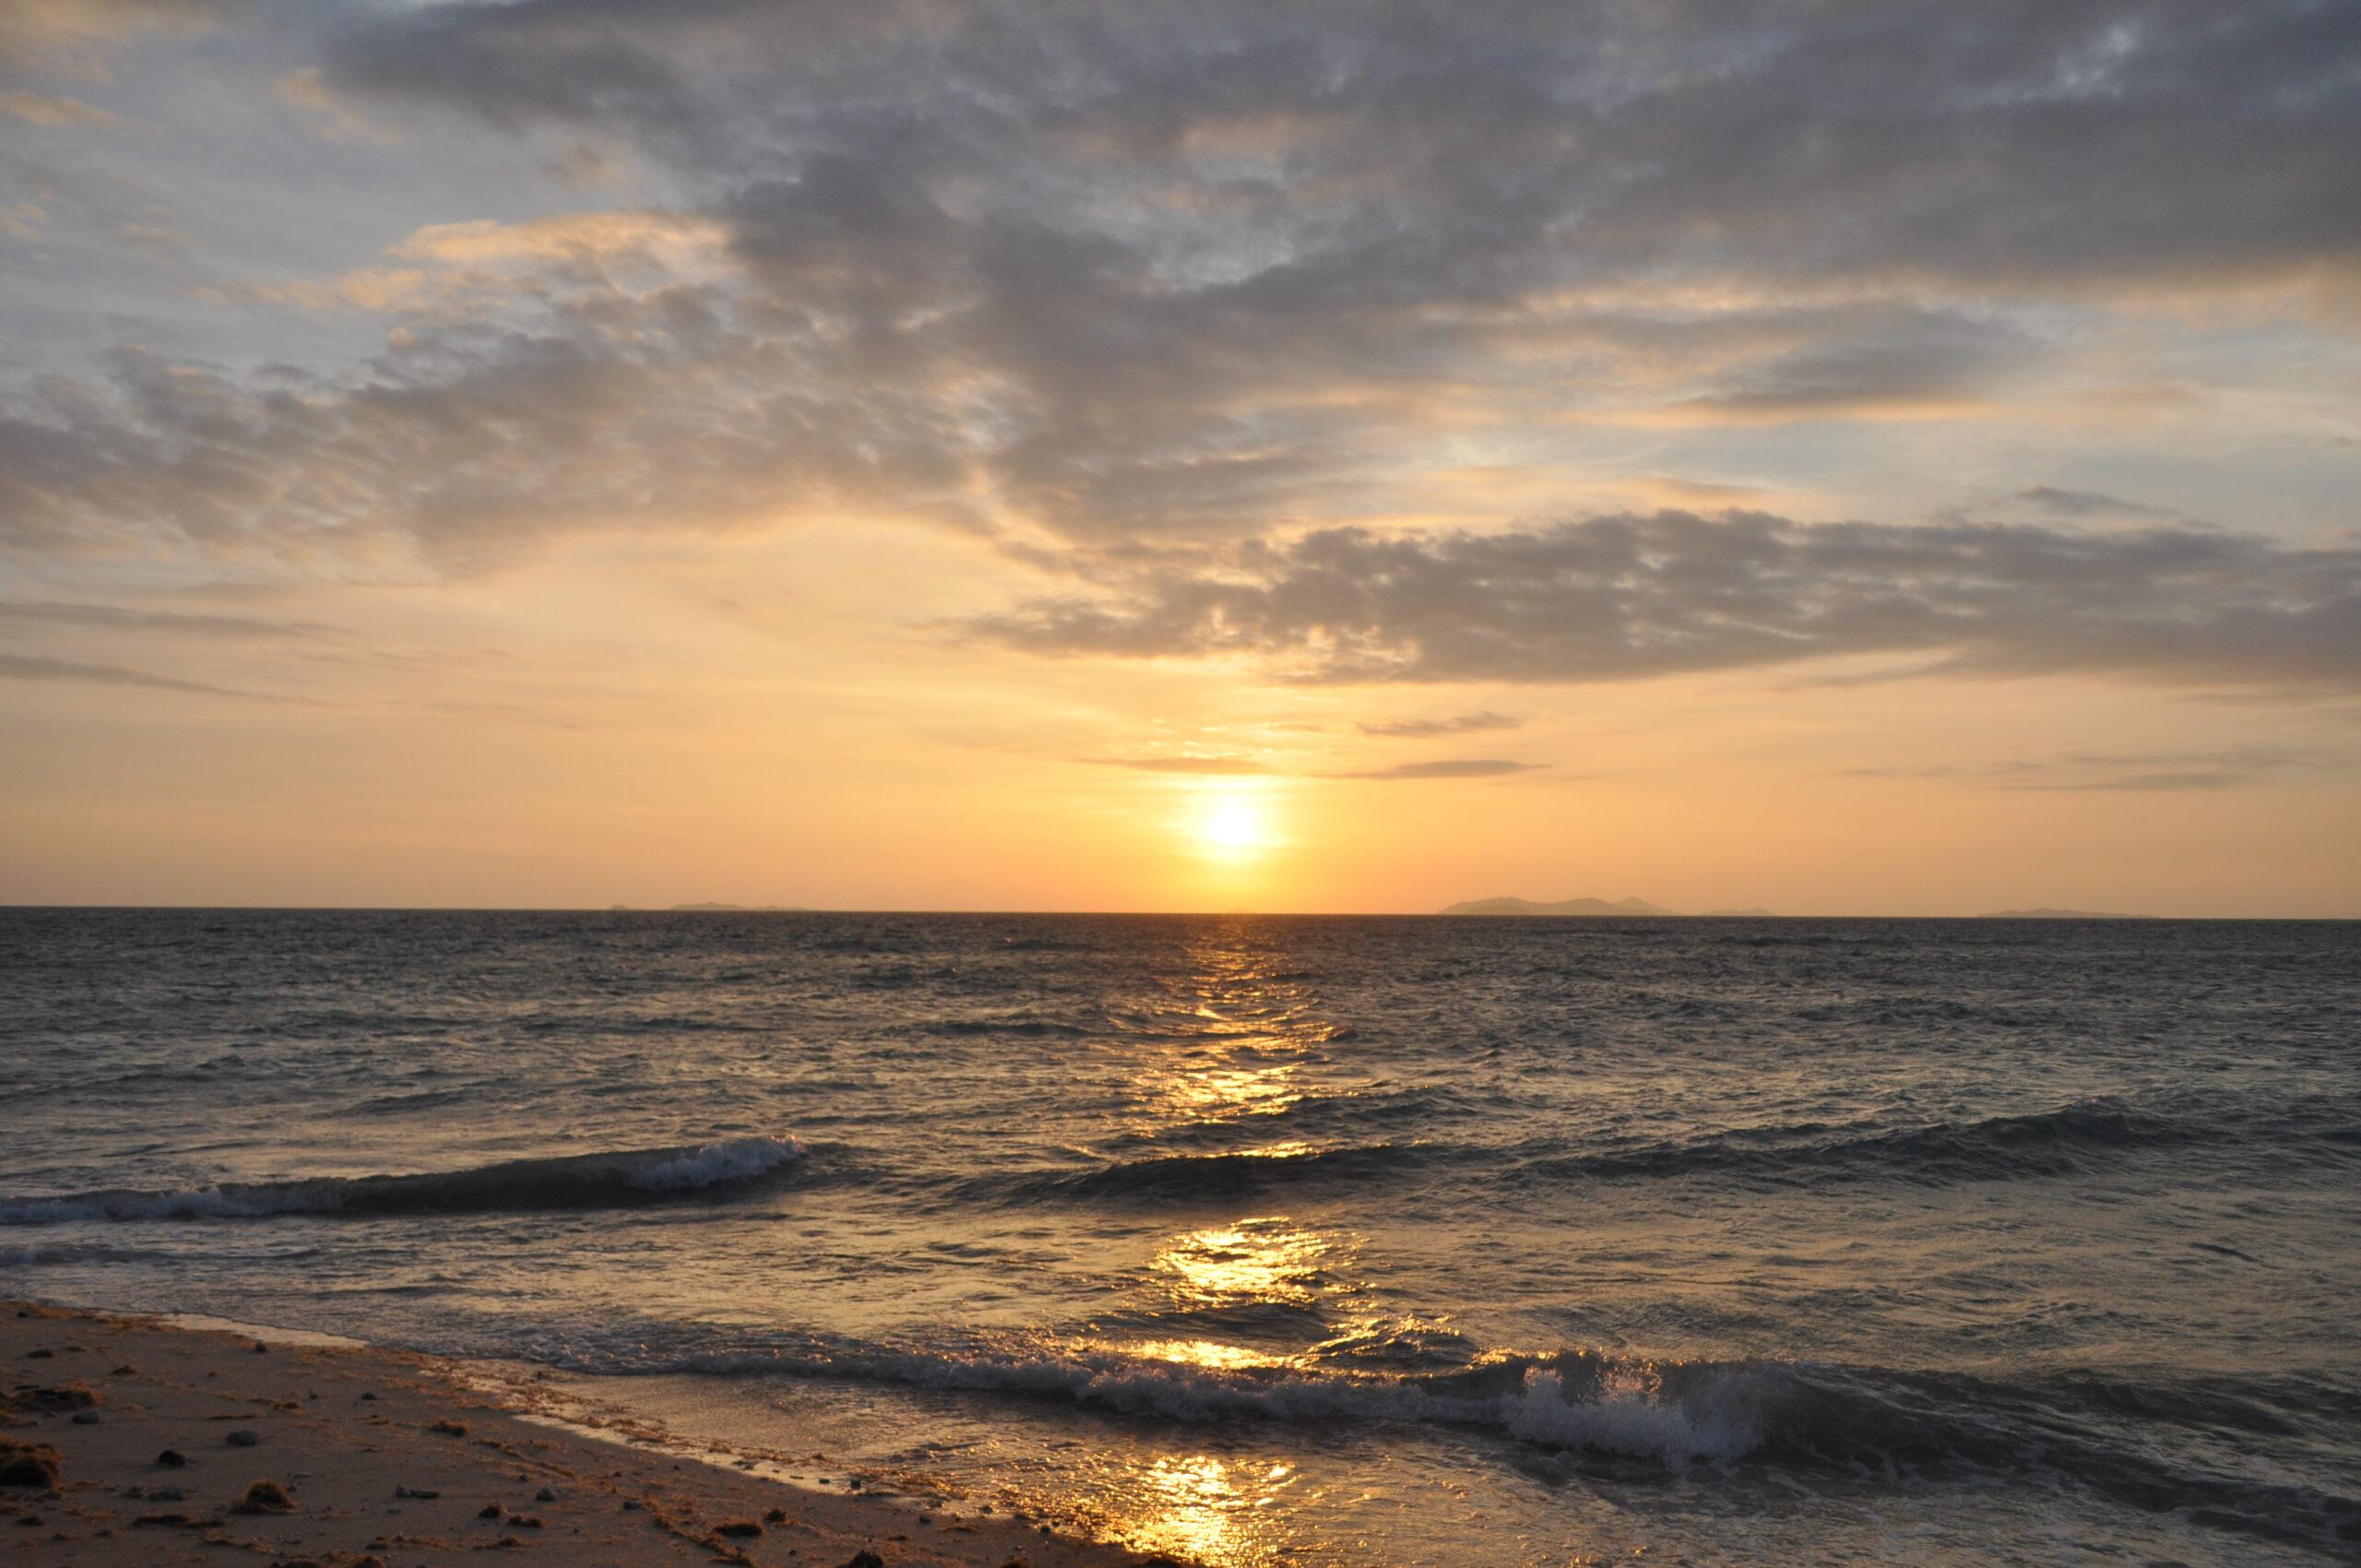 Sunset at Beachcomber Island Resort, Fiji